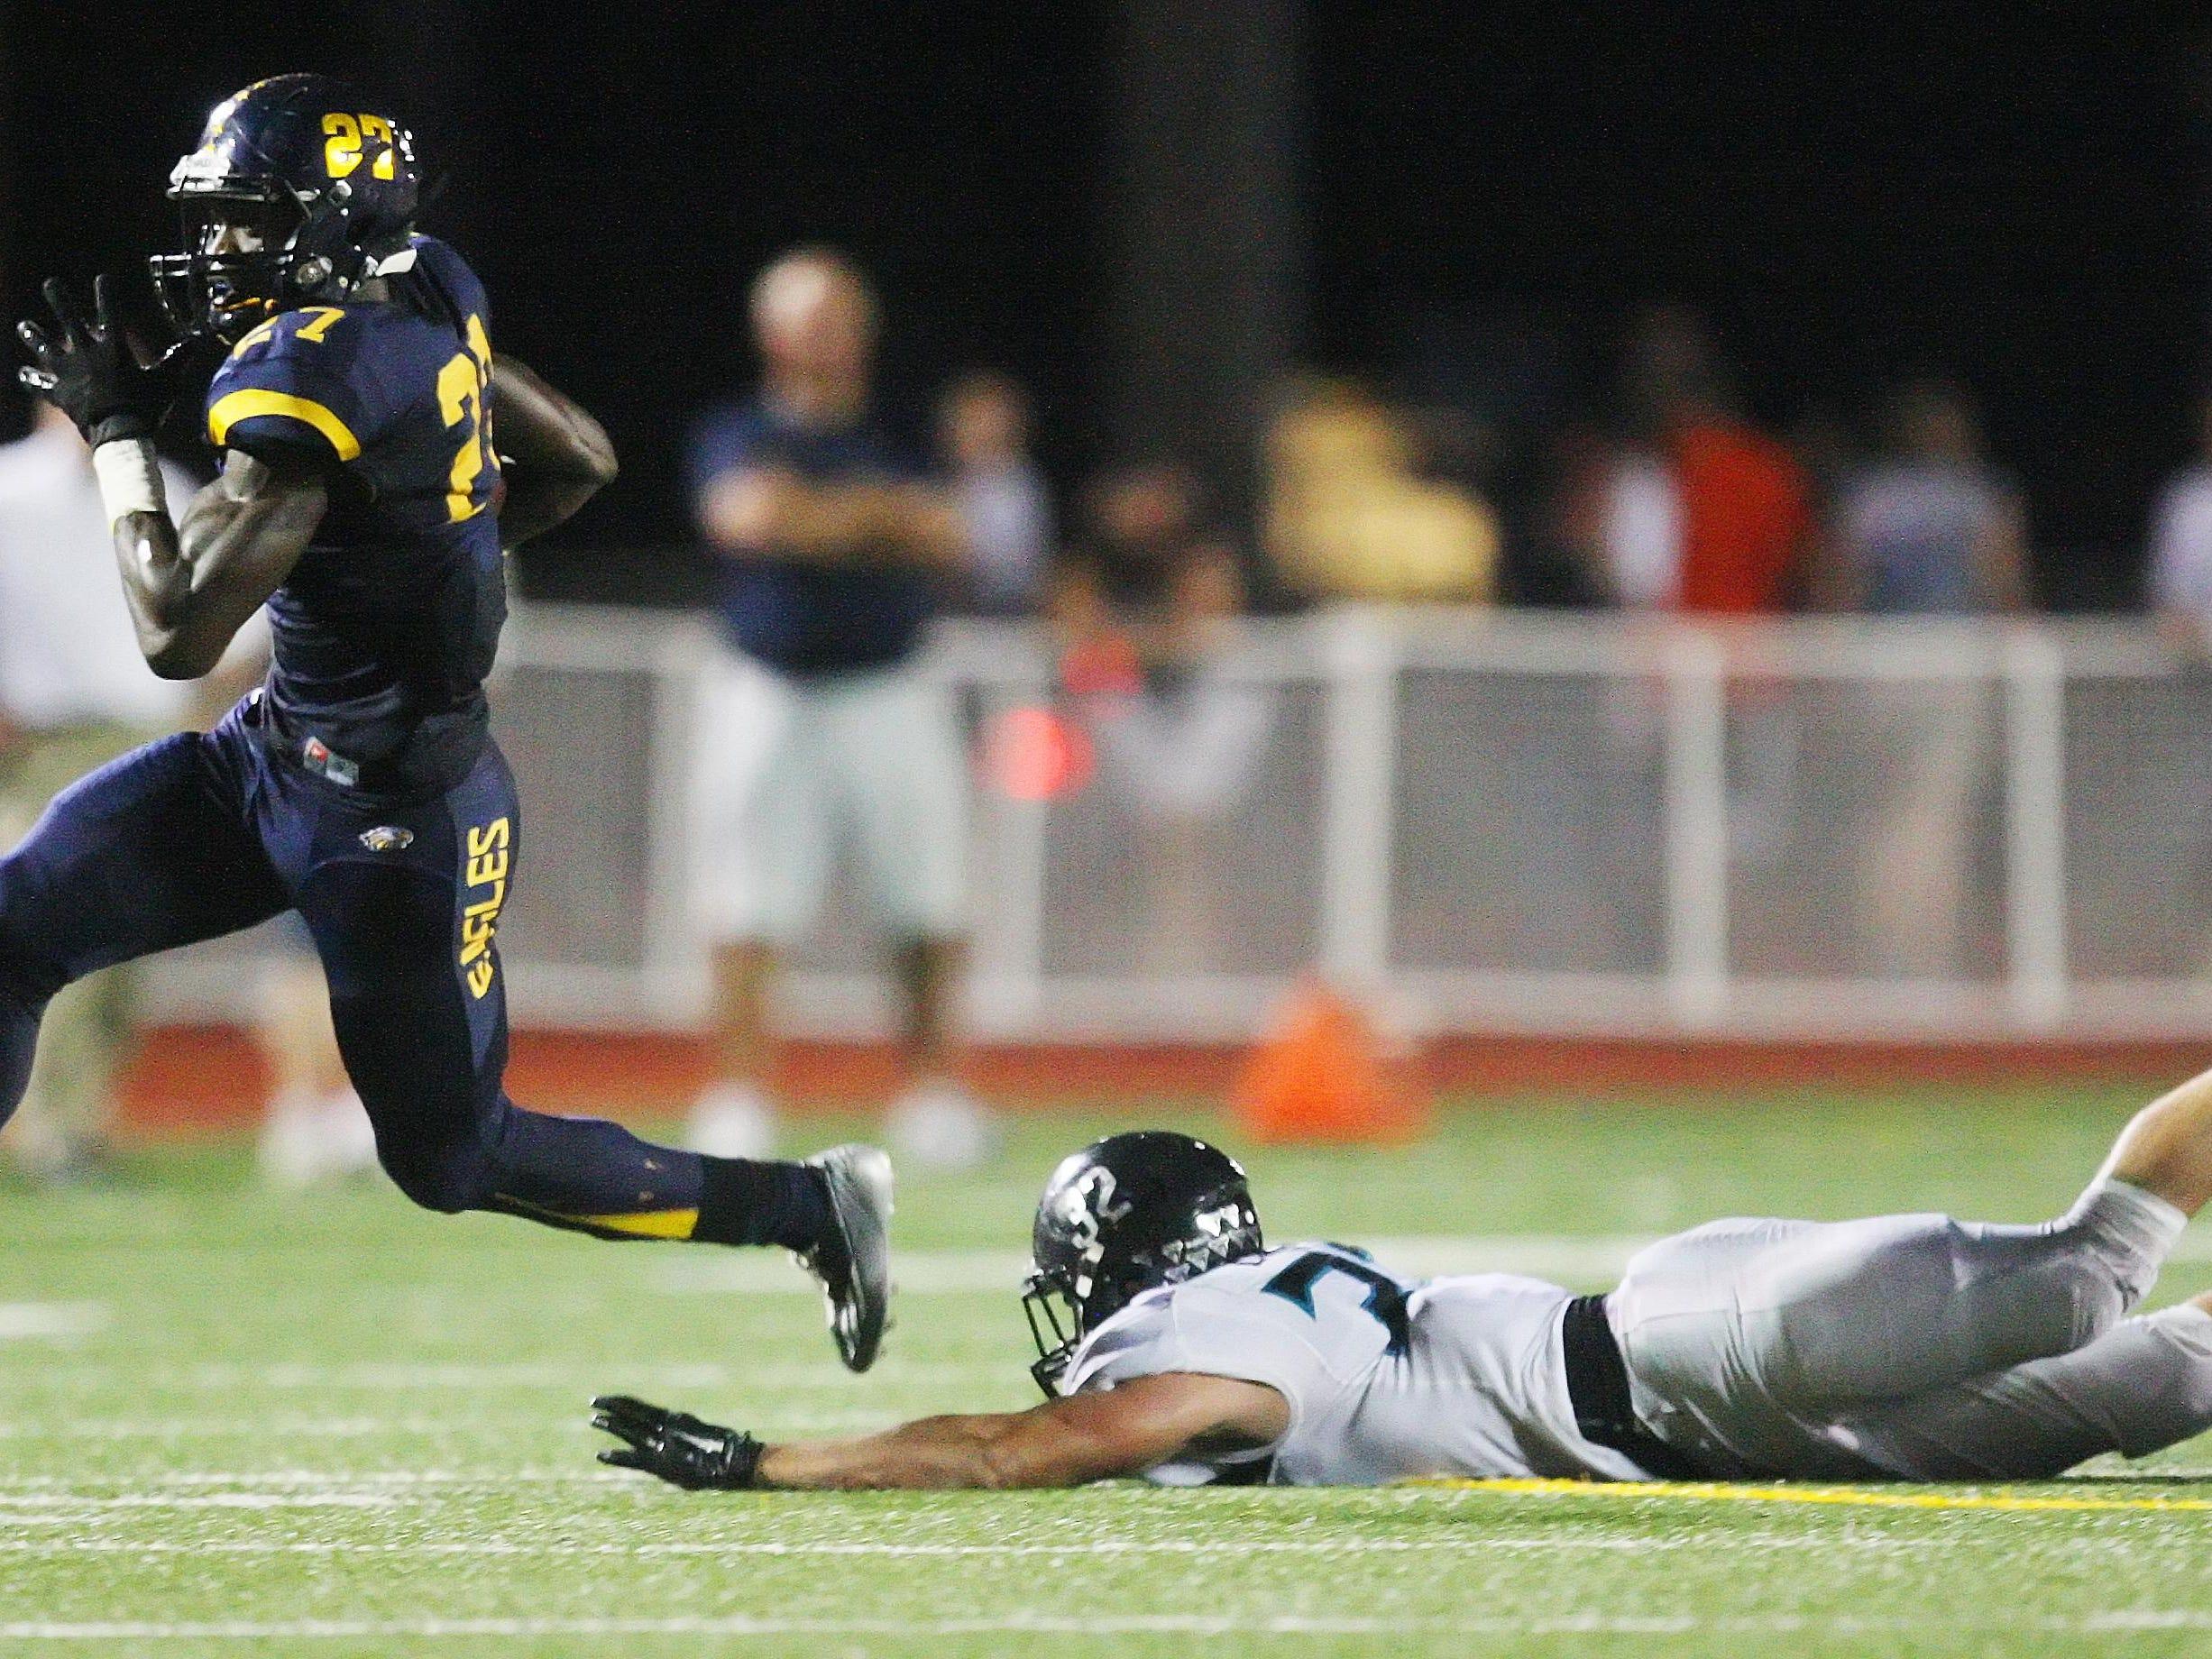 Naples High School's Carlin Fils-Aime scores a touchdown against Gulf Coast on Friday at Naples High School.